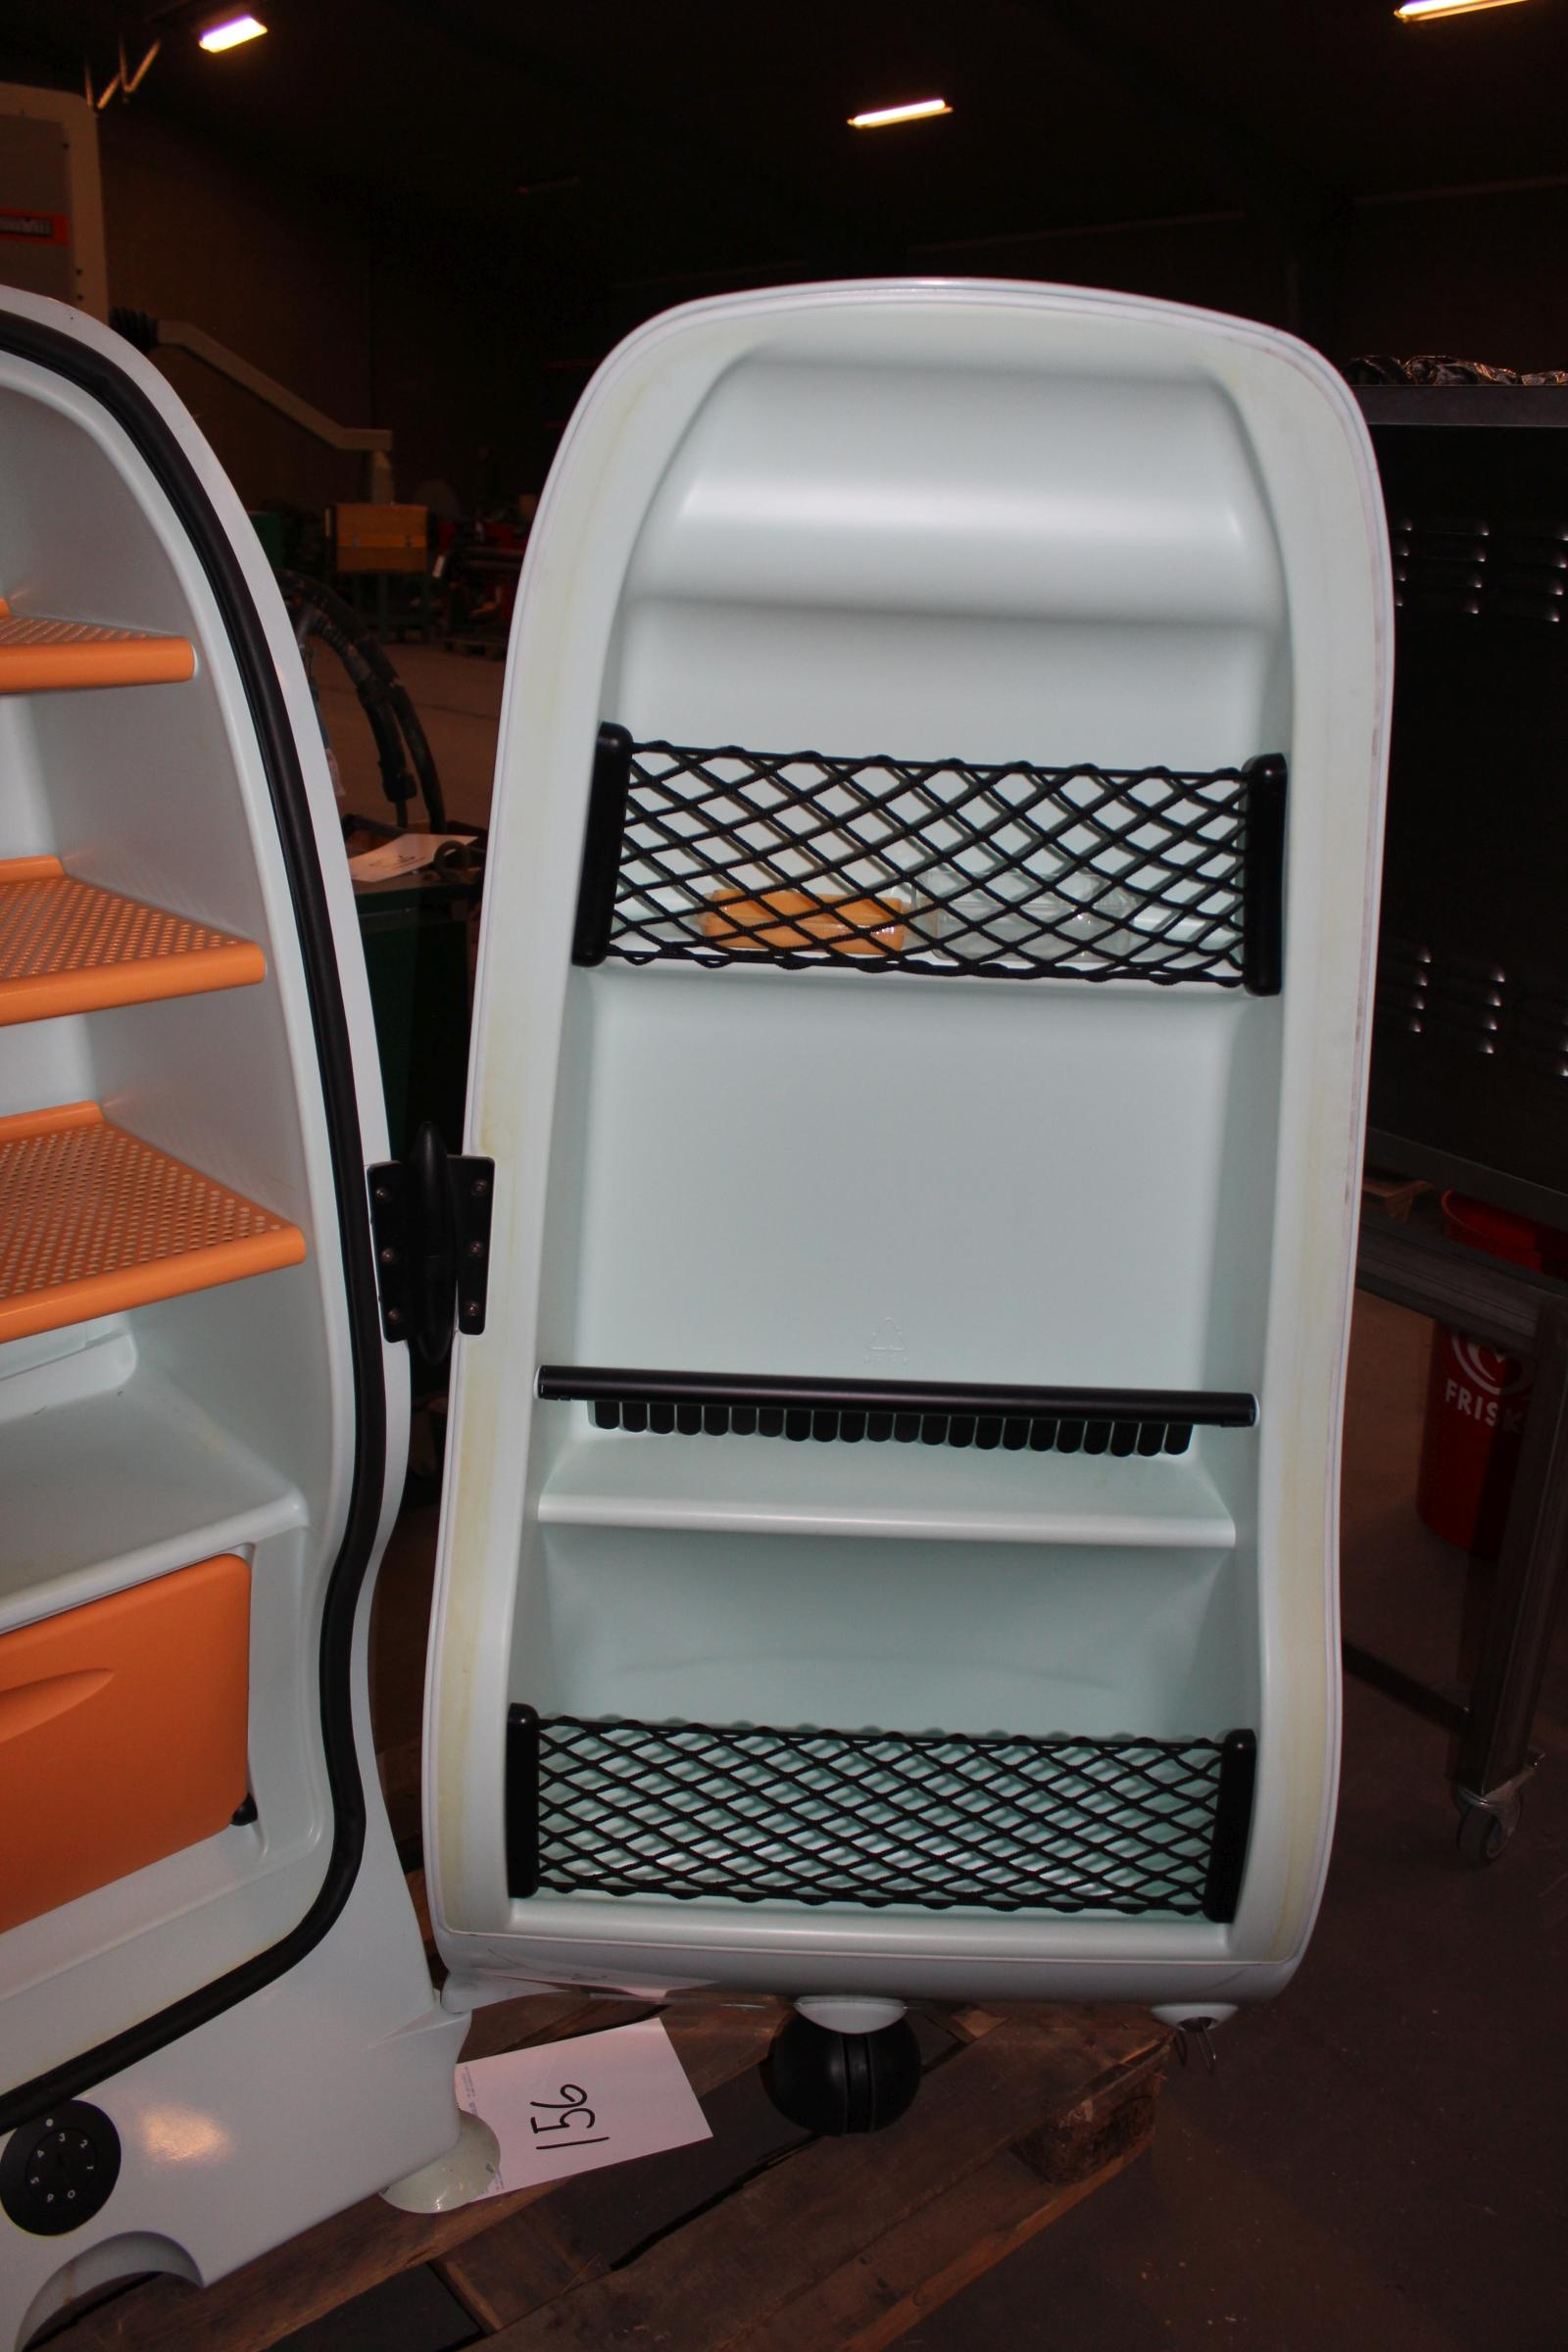 Zanussi Kühlschrank Design R pezzeta 143x55x56 cm - KJ Auktion ...